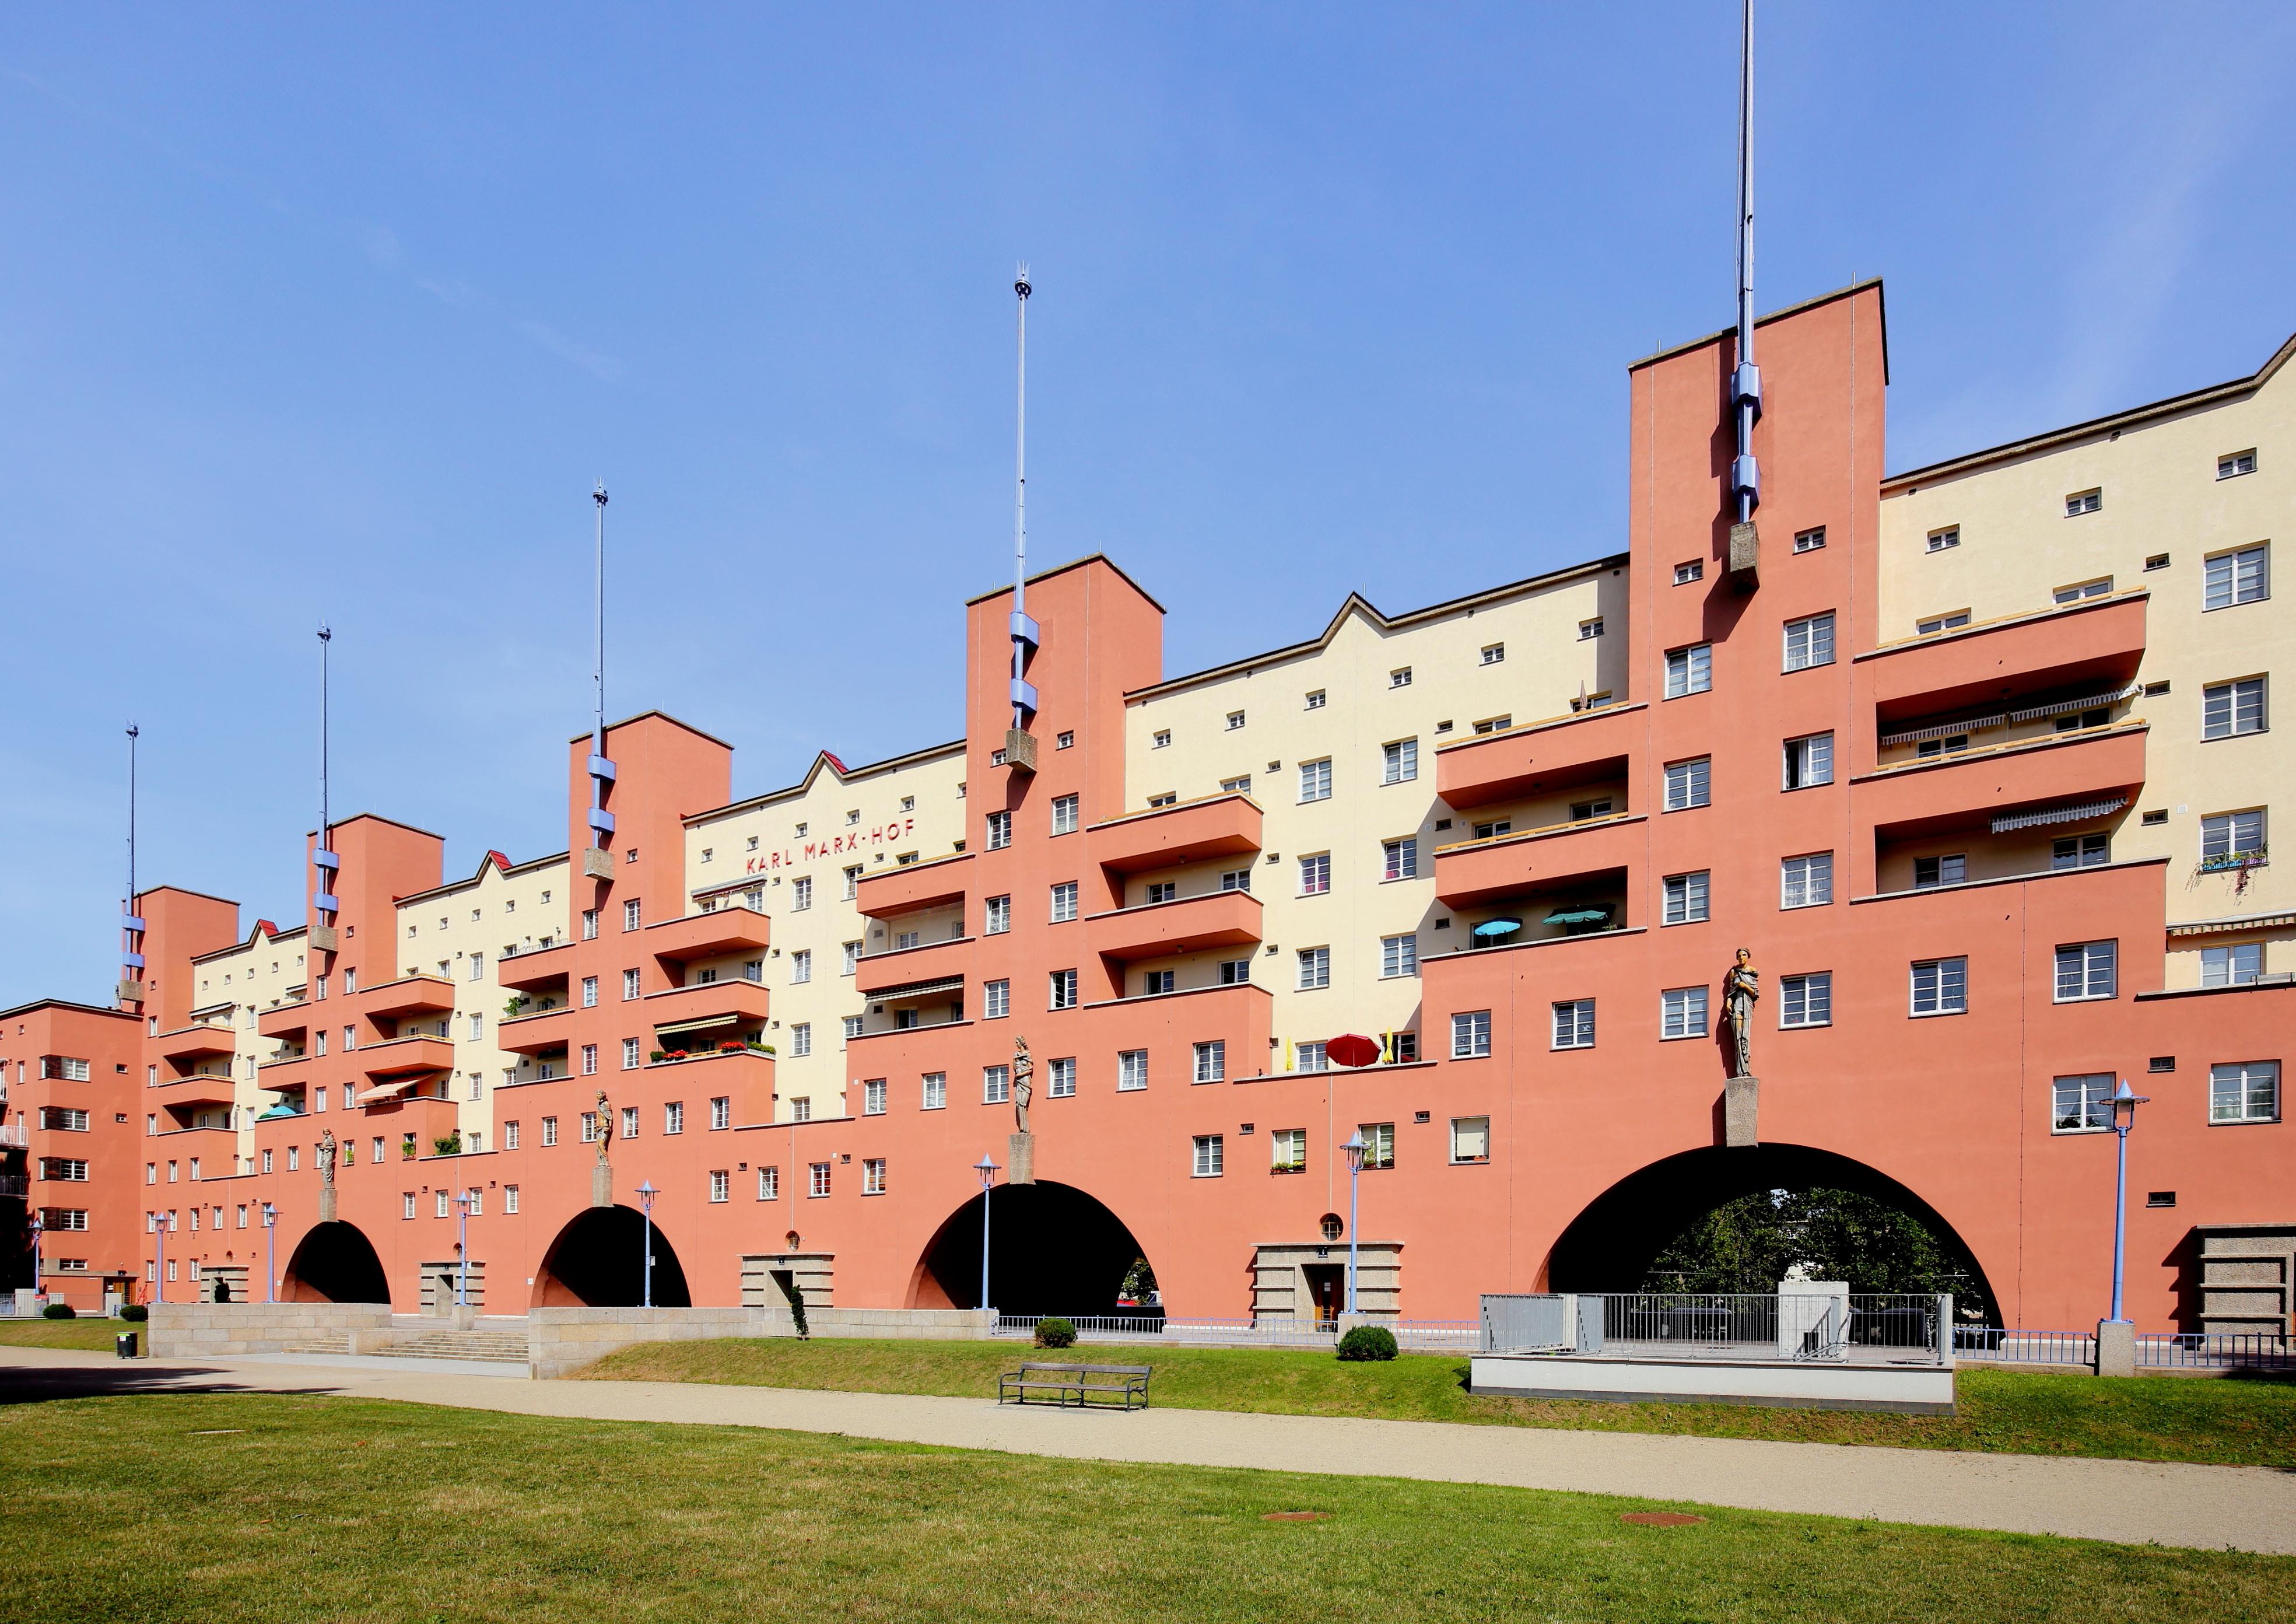 File:Döbling (Wien) - Karl-Marx-Hof.JPG - Wikipedia